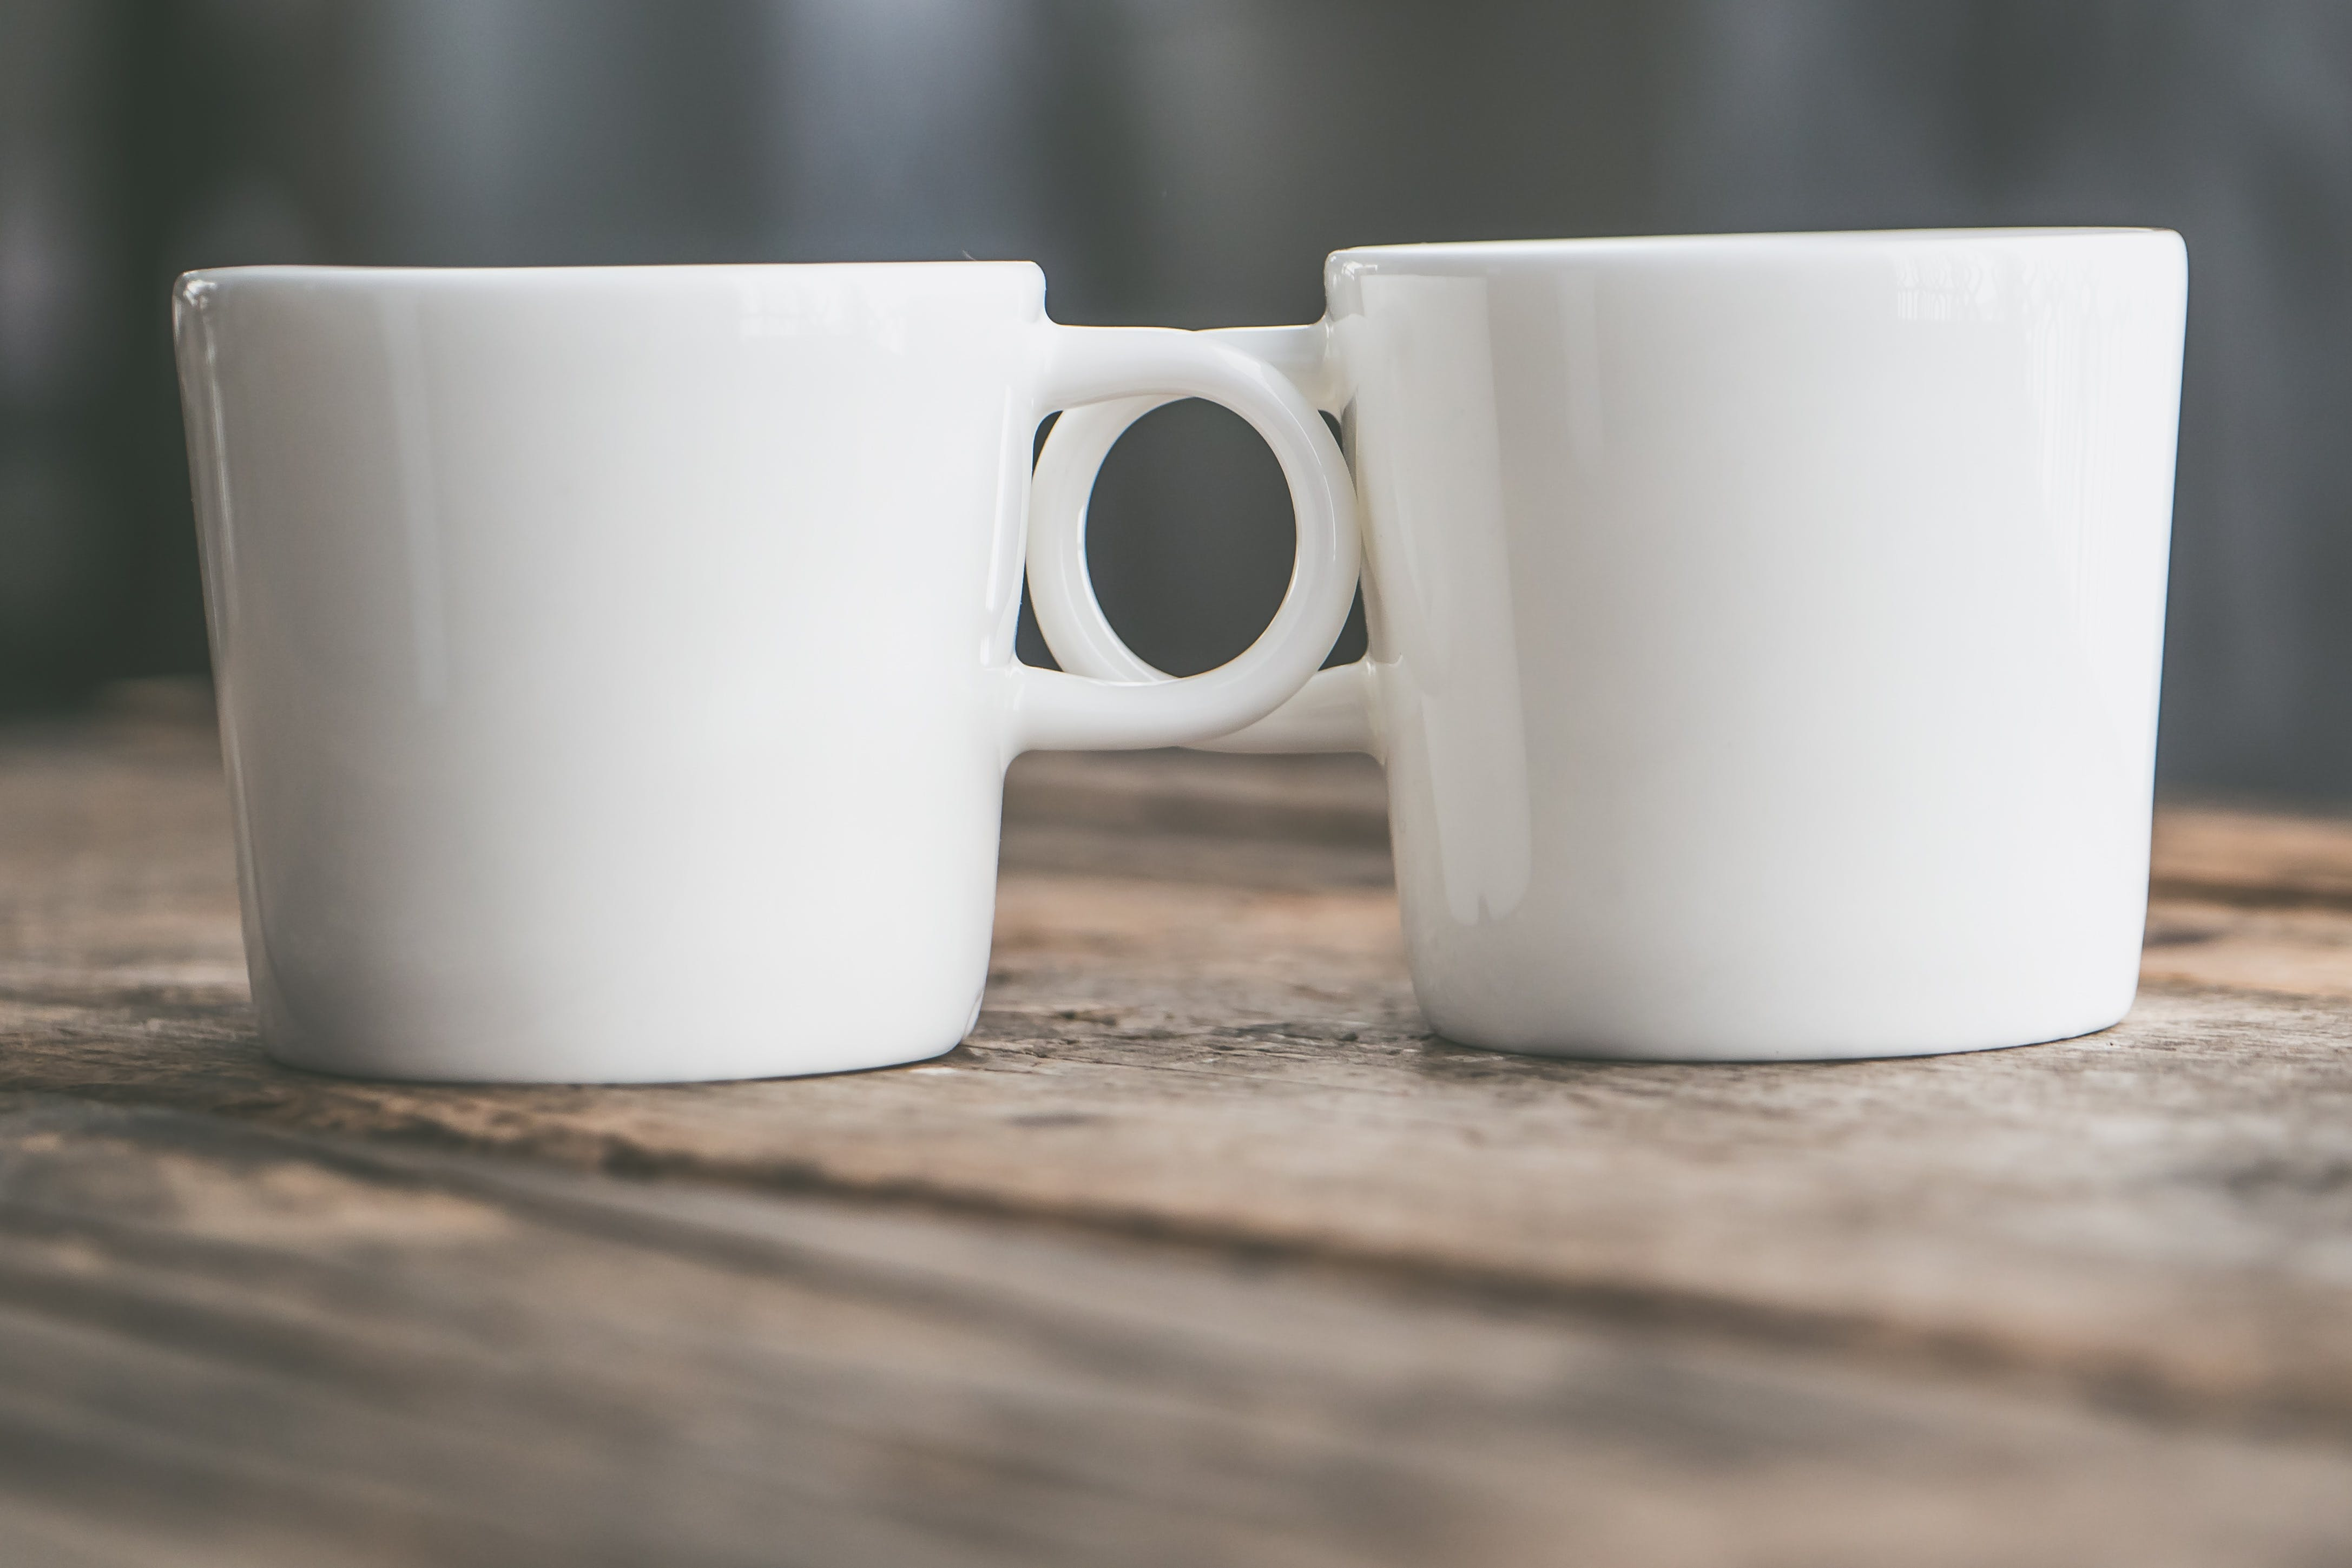 blur, ceramic cup, close-up